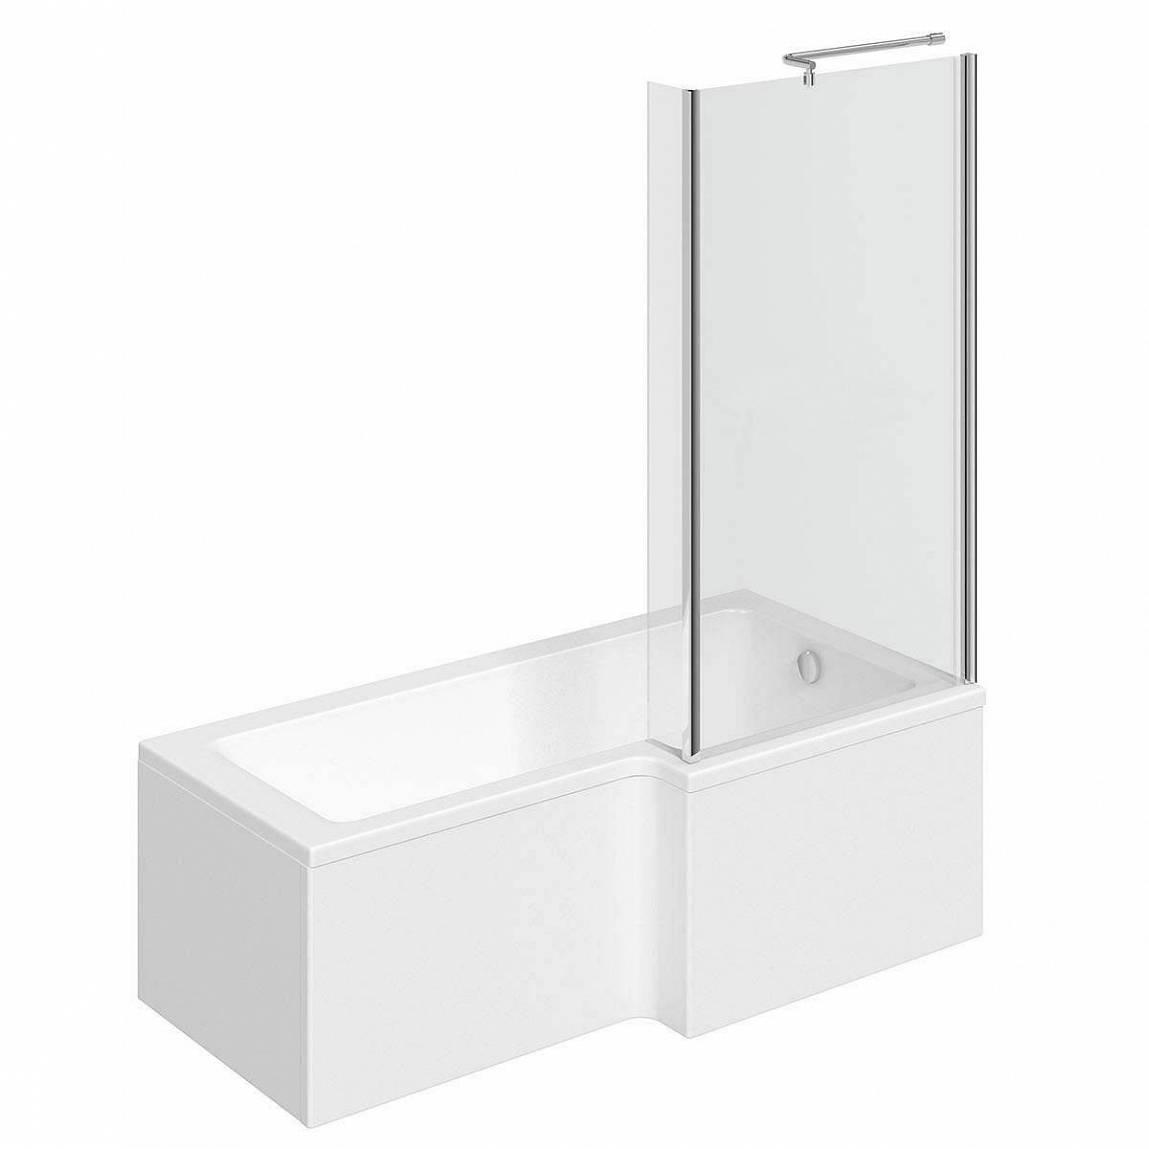 Image of Boston Shower Bath 1700 x 850 RH inc. Screen